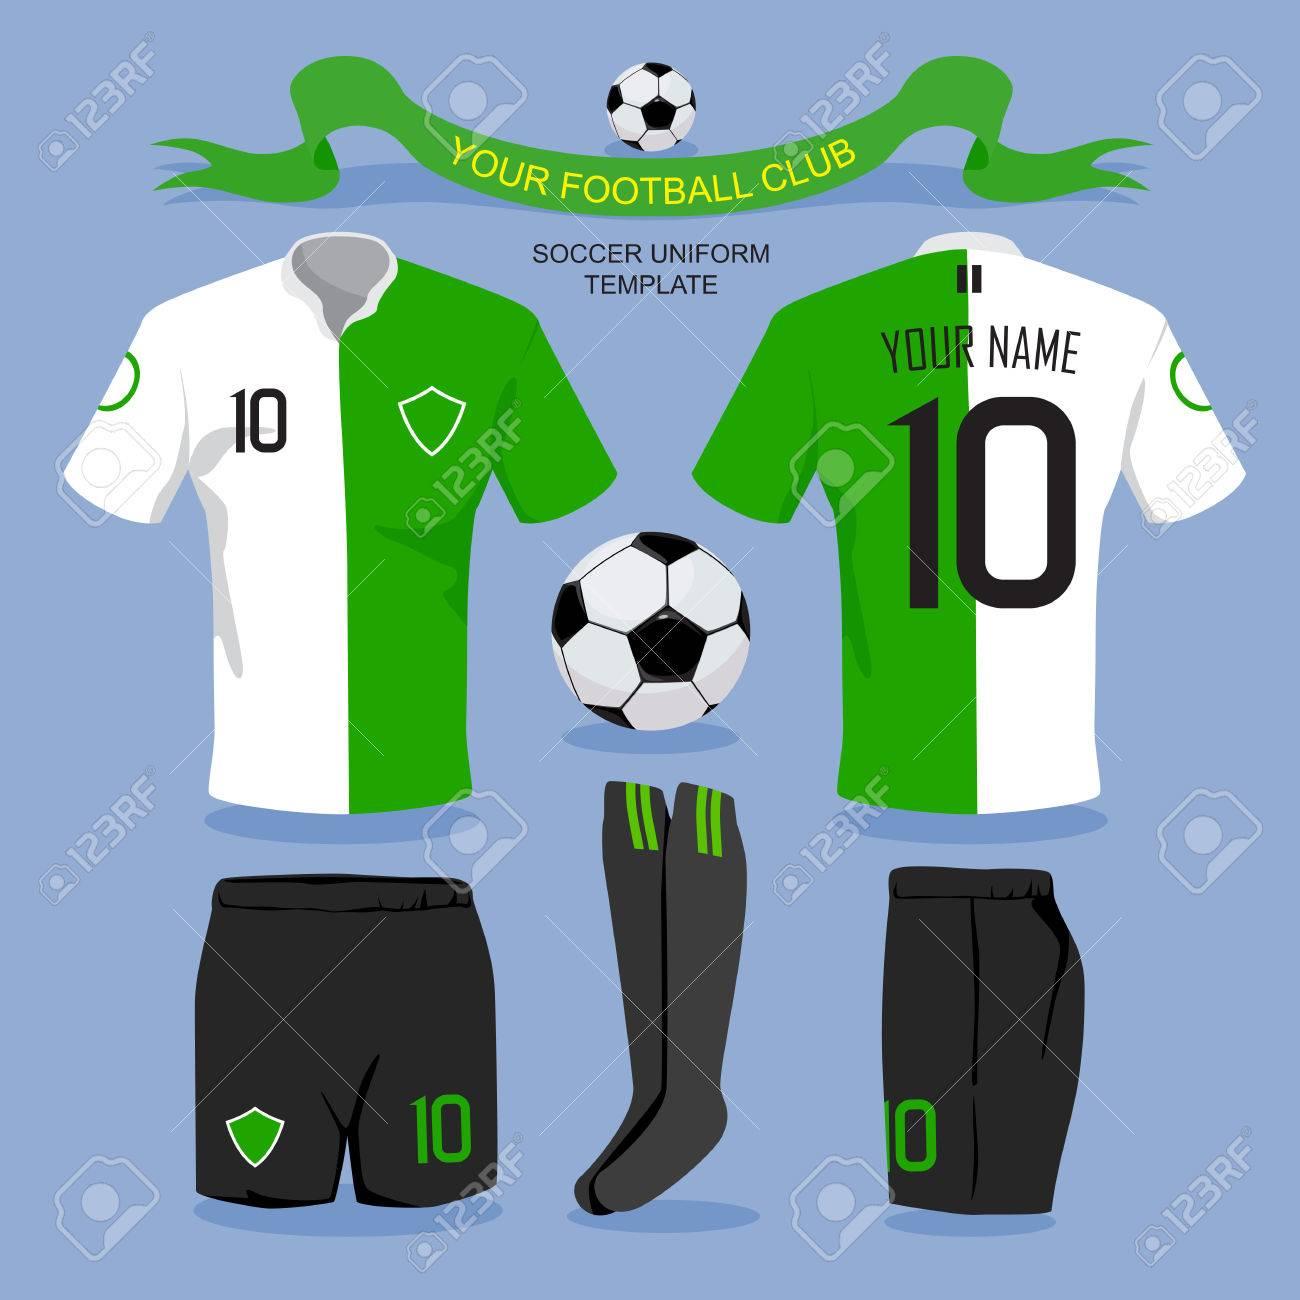 Soccer Uniform Template For Your Football Club Illustration Design Stock Vector